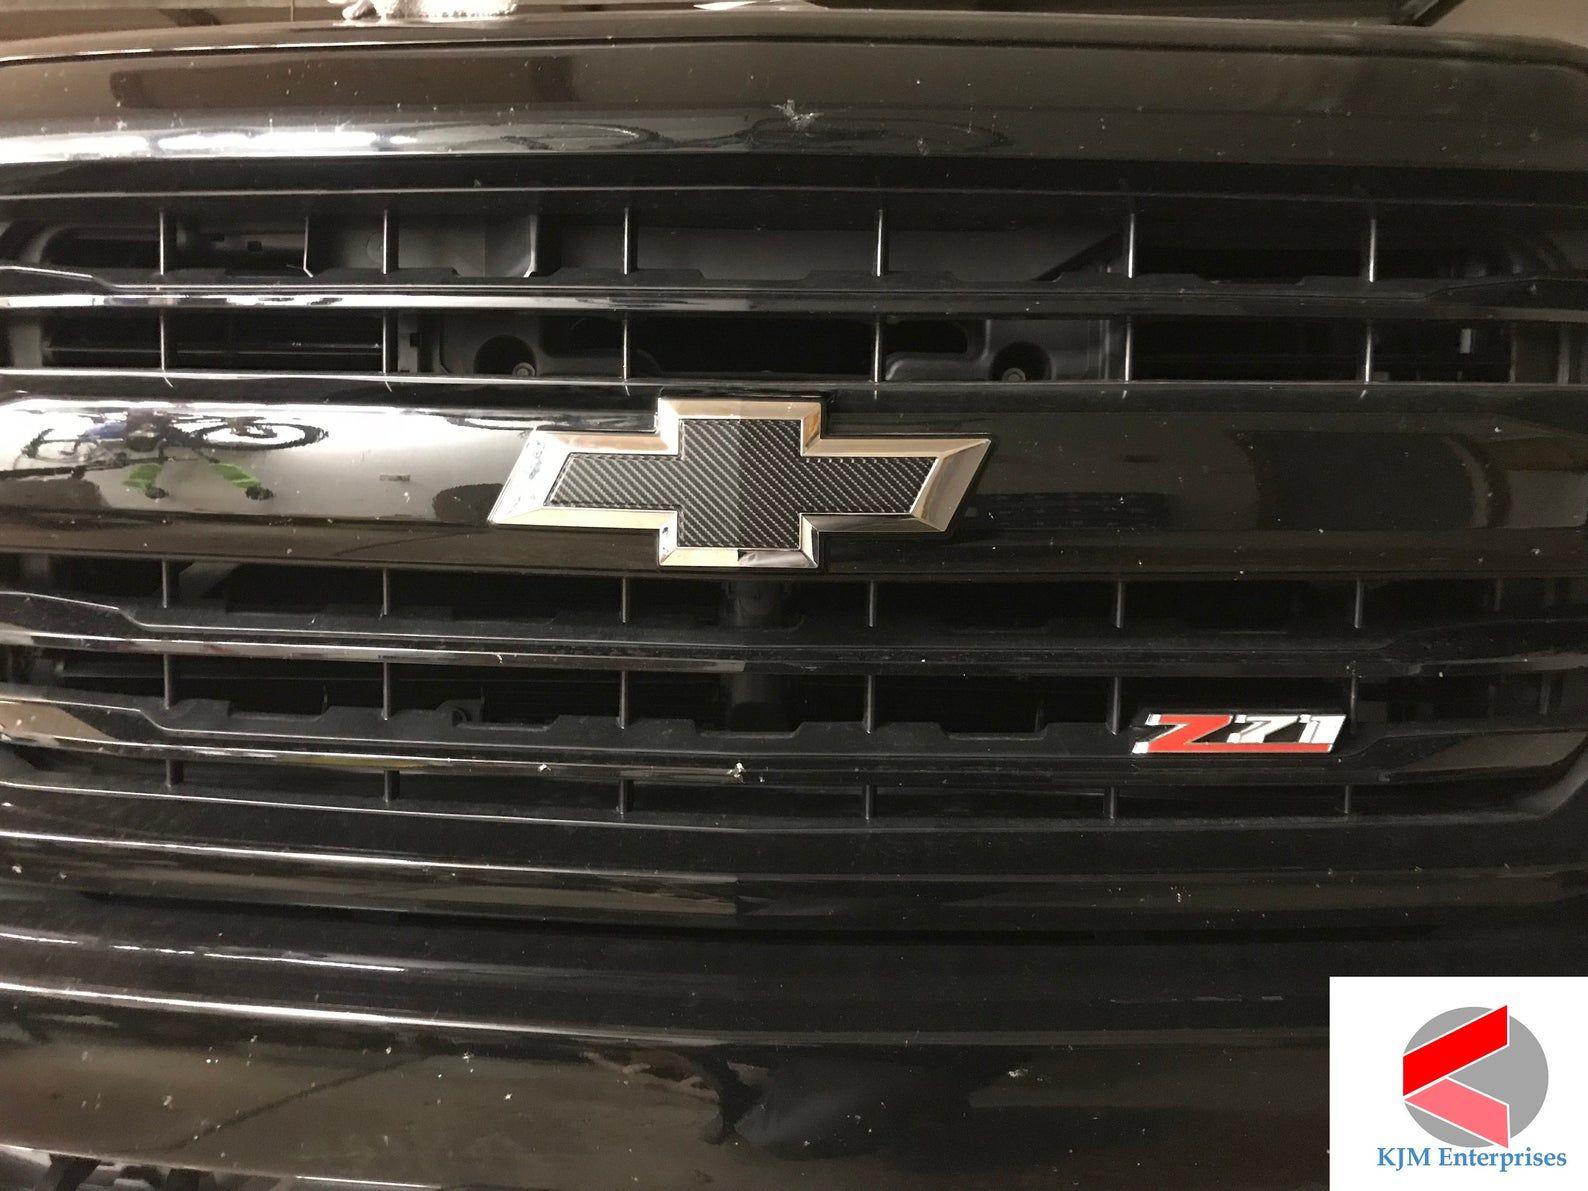 20072013 Silverado Chevy Emblem Overlay Bowtie Decals